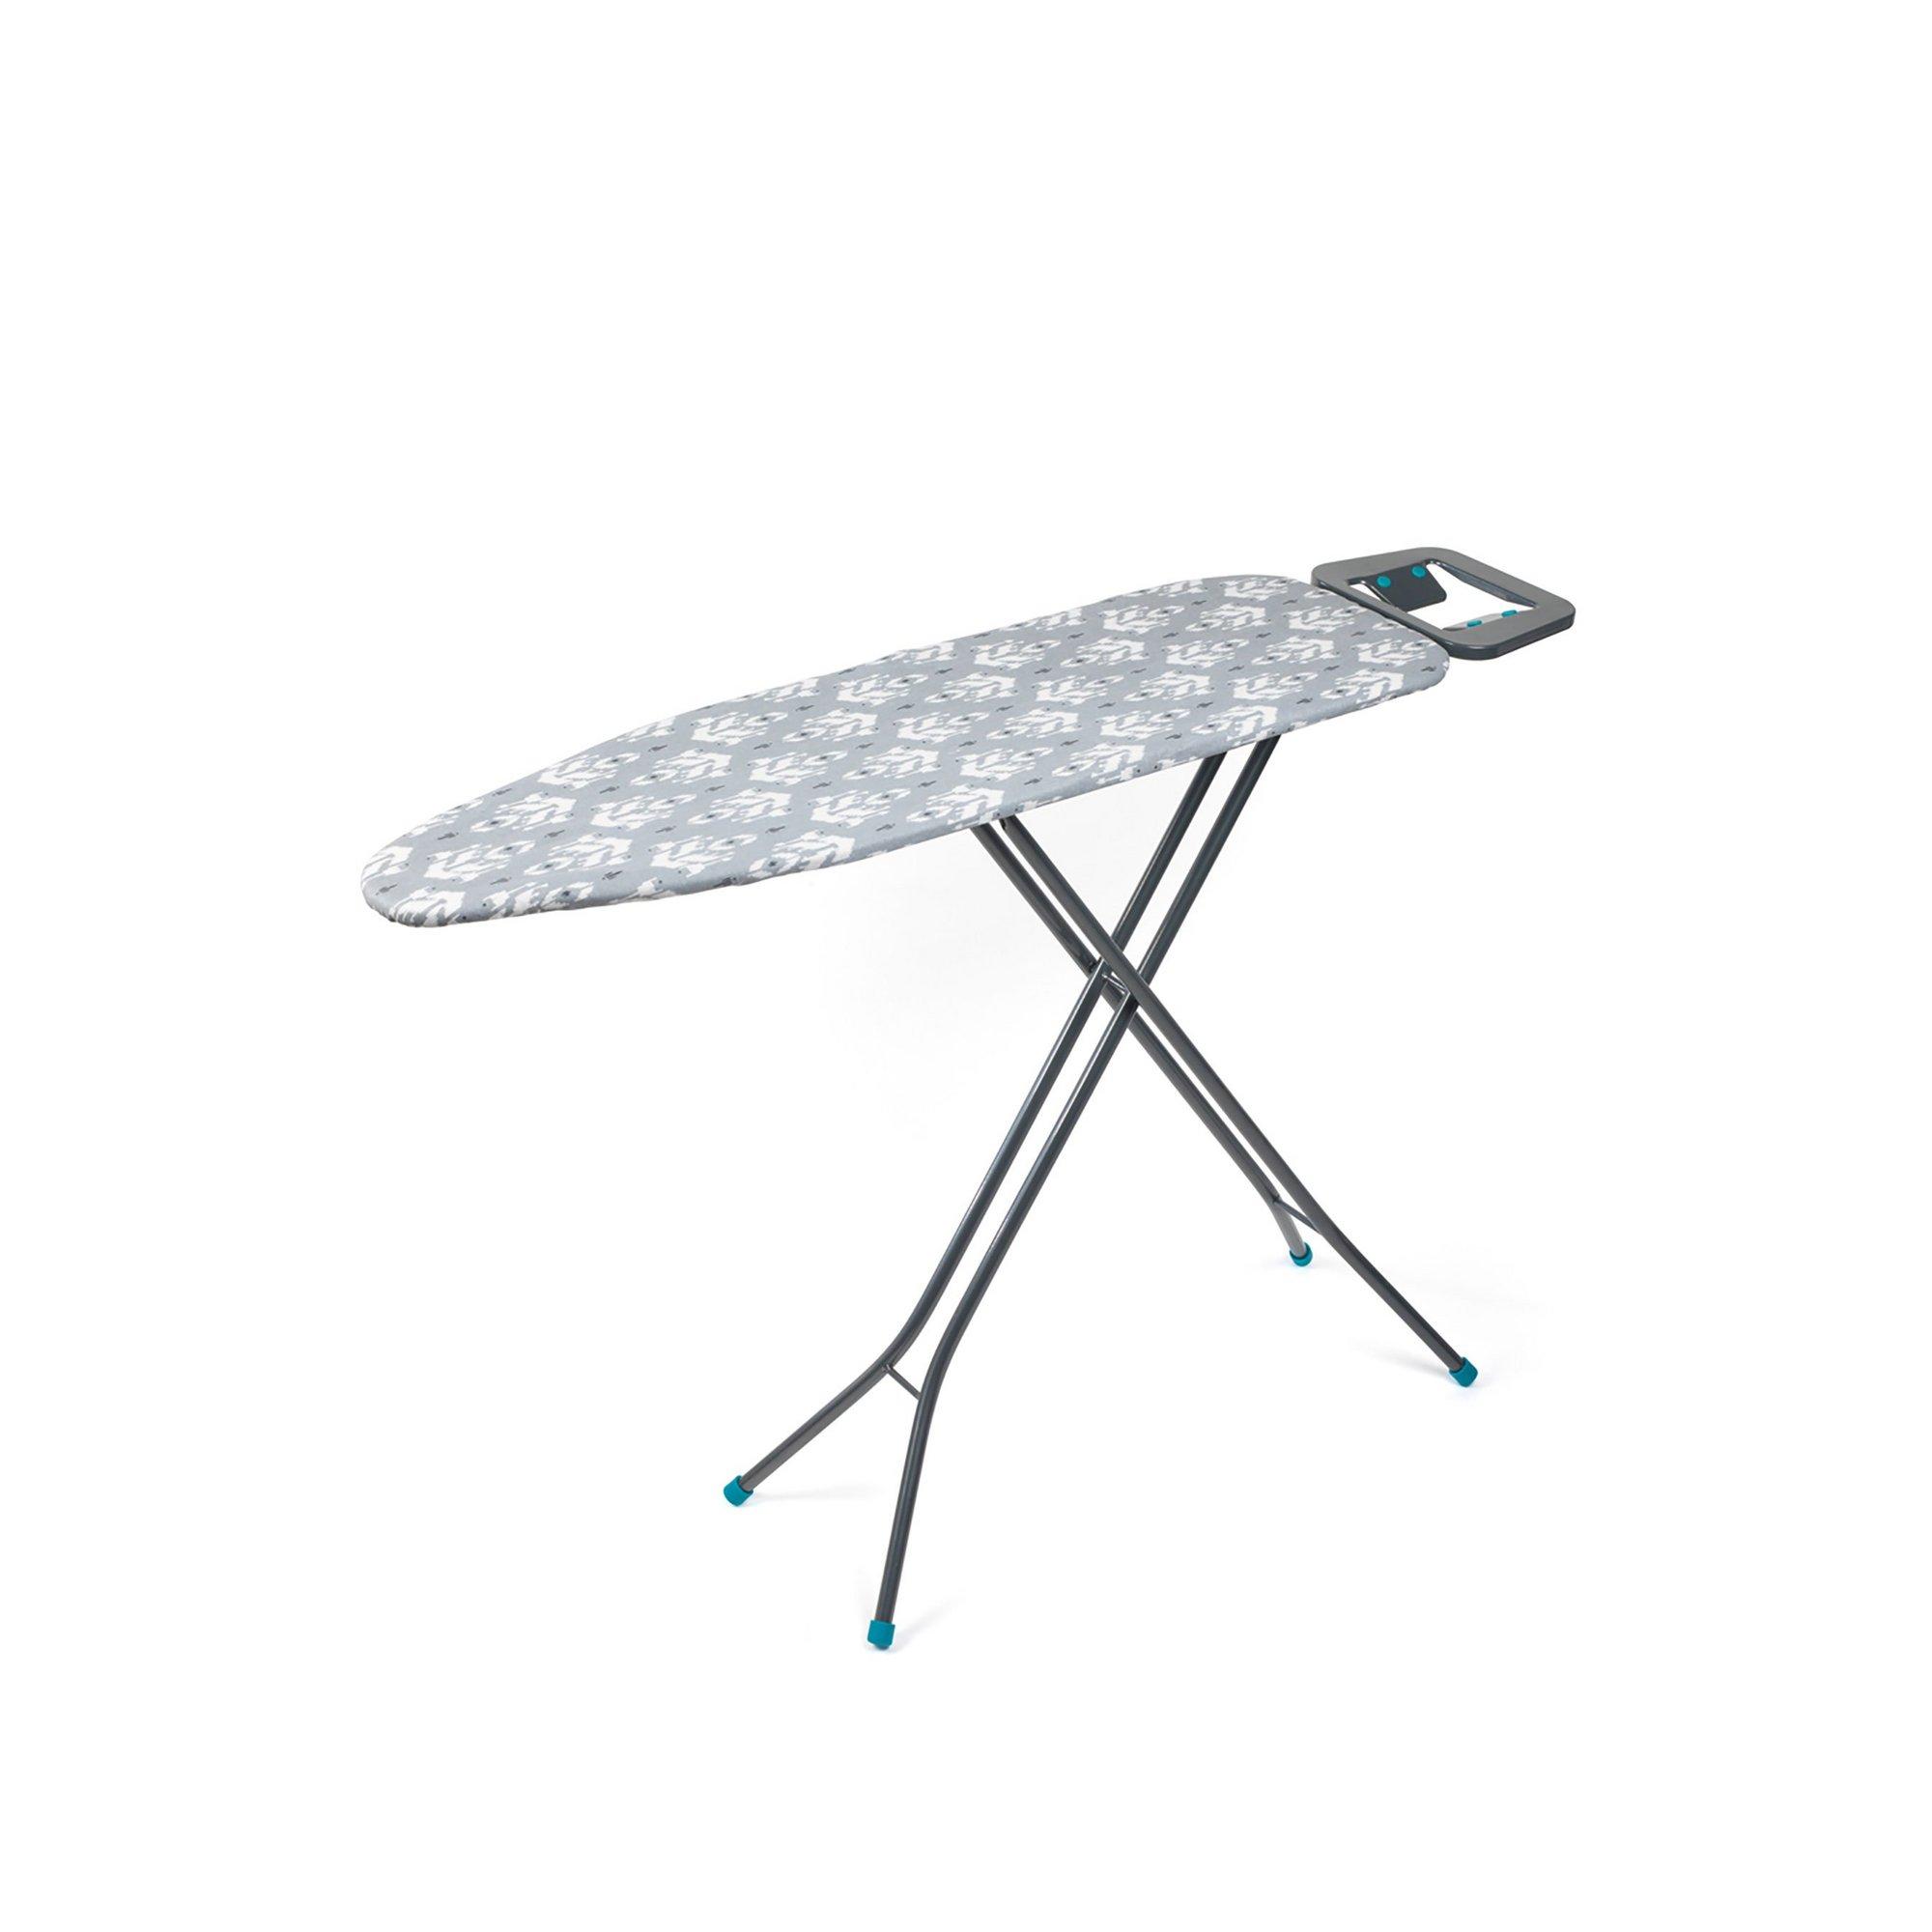 Image of Beldray Gallant Ironing Board